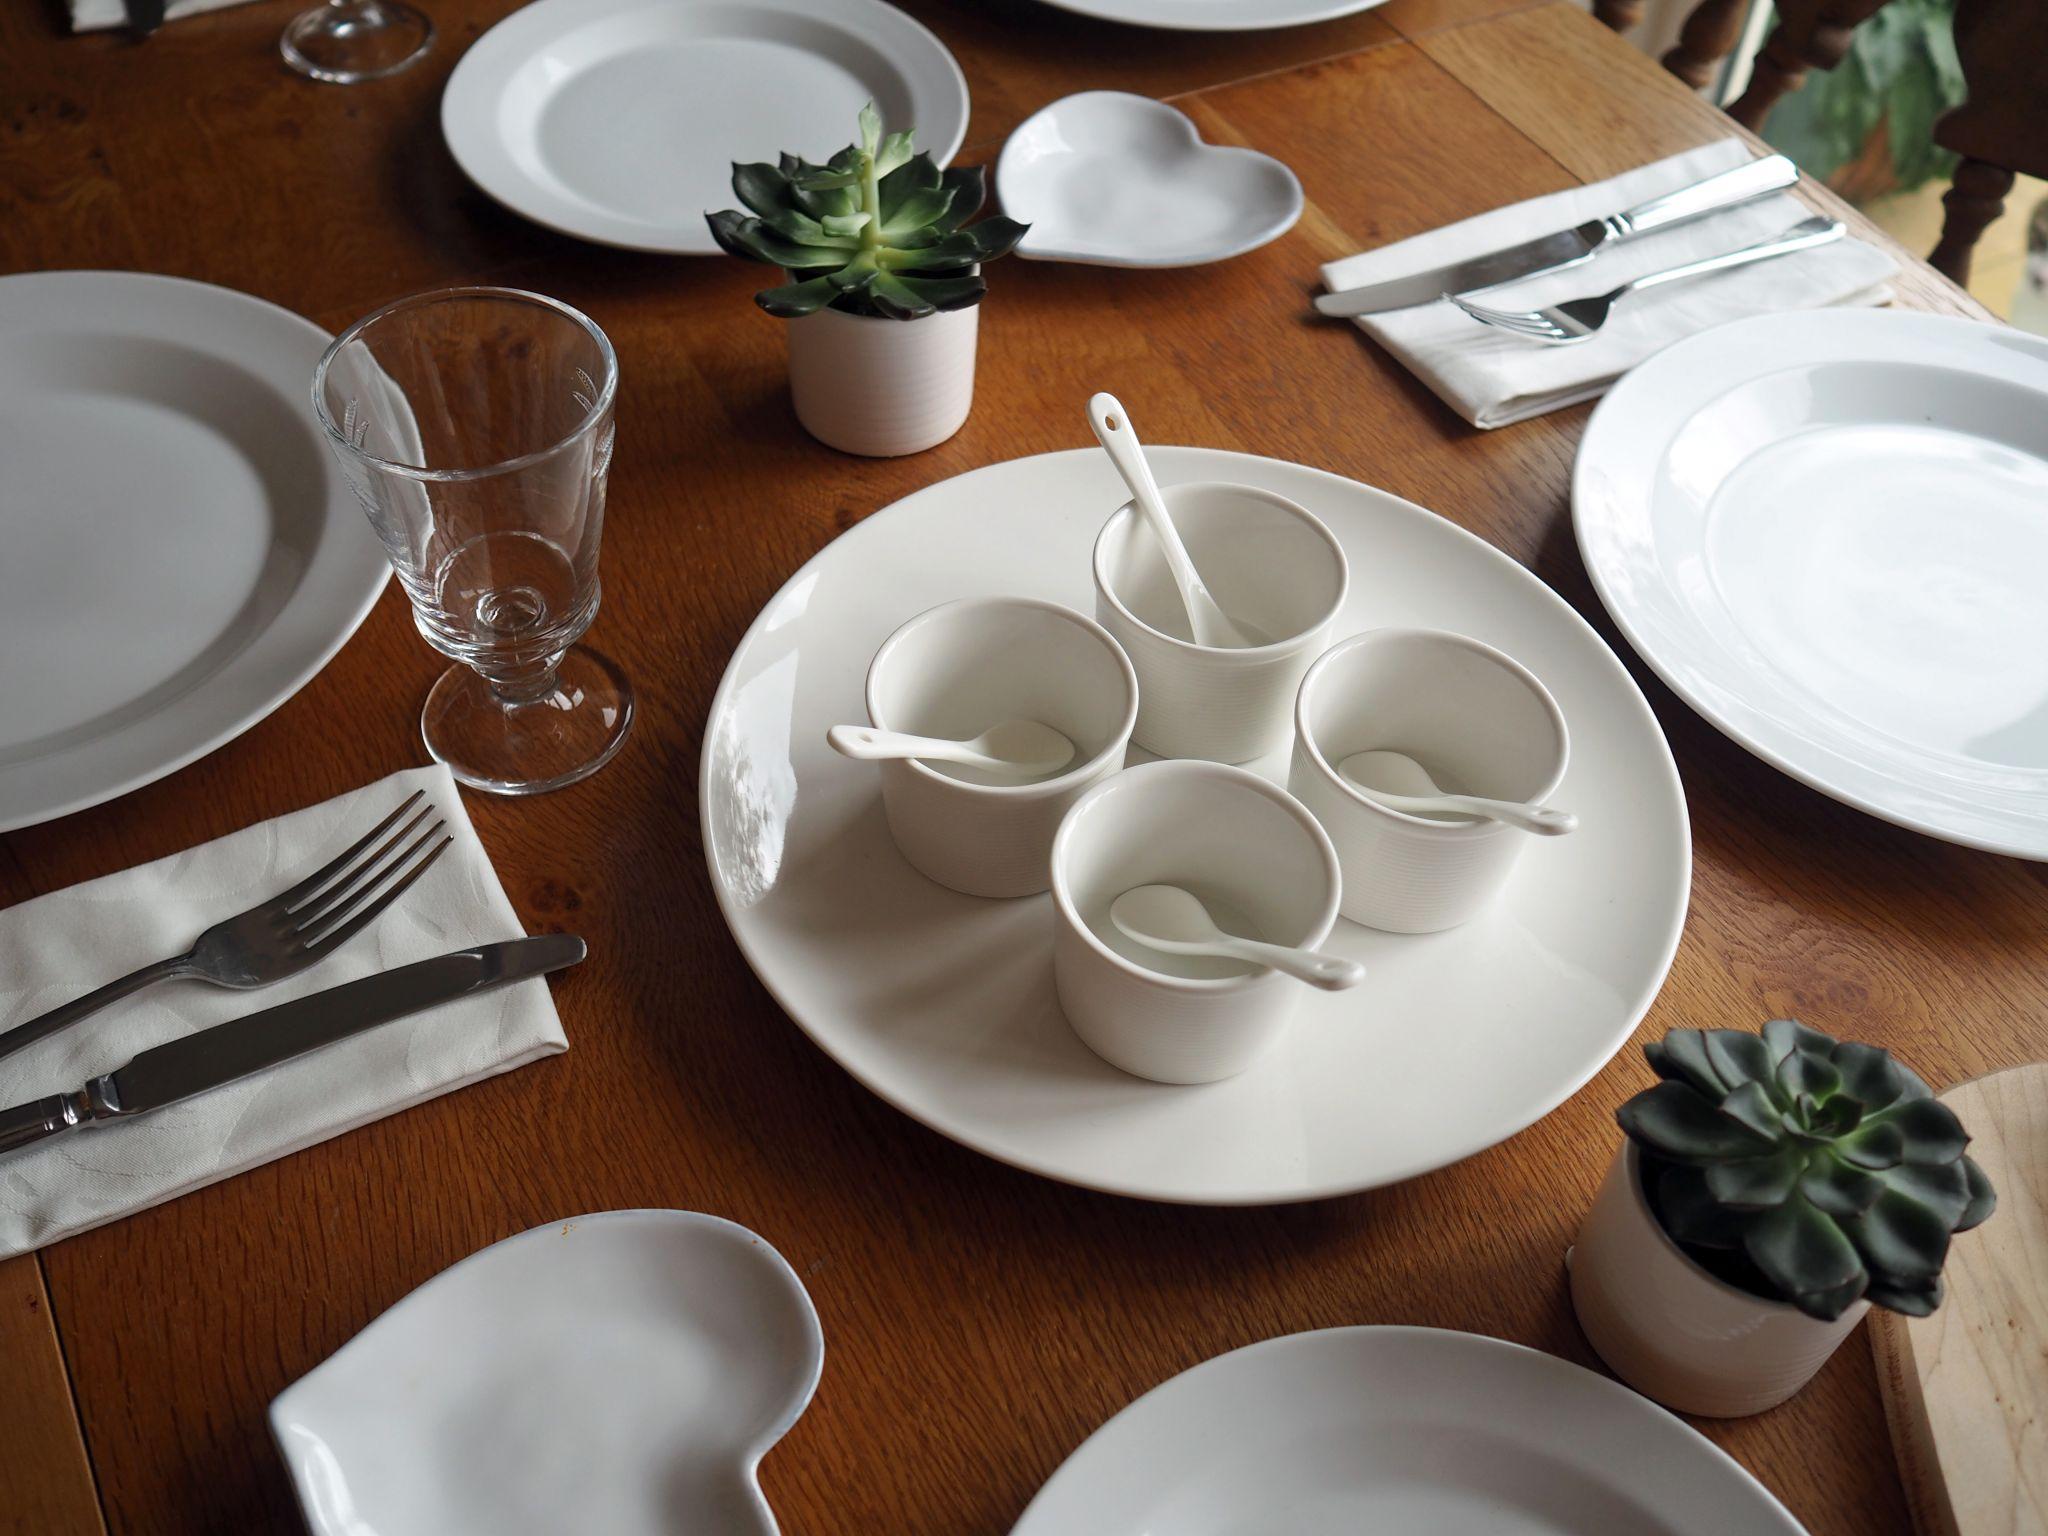 white-table-setting-james-martin-denby-dip-dishes-ramekins-ceramic-spoons